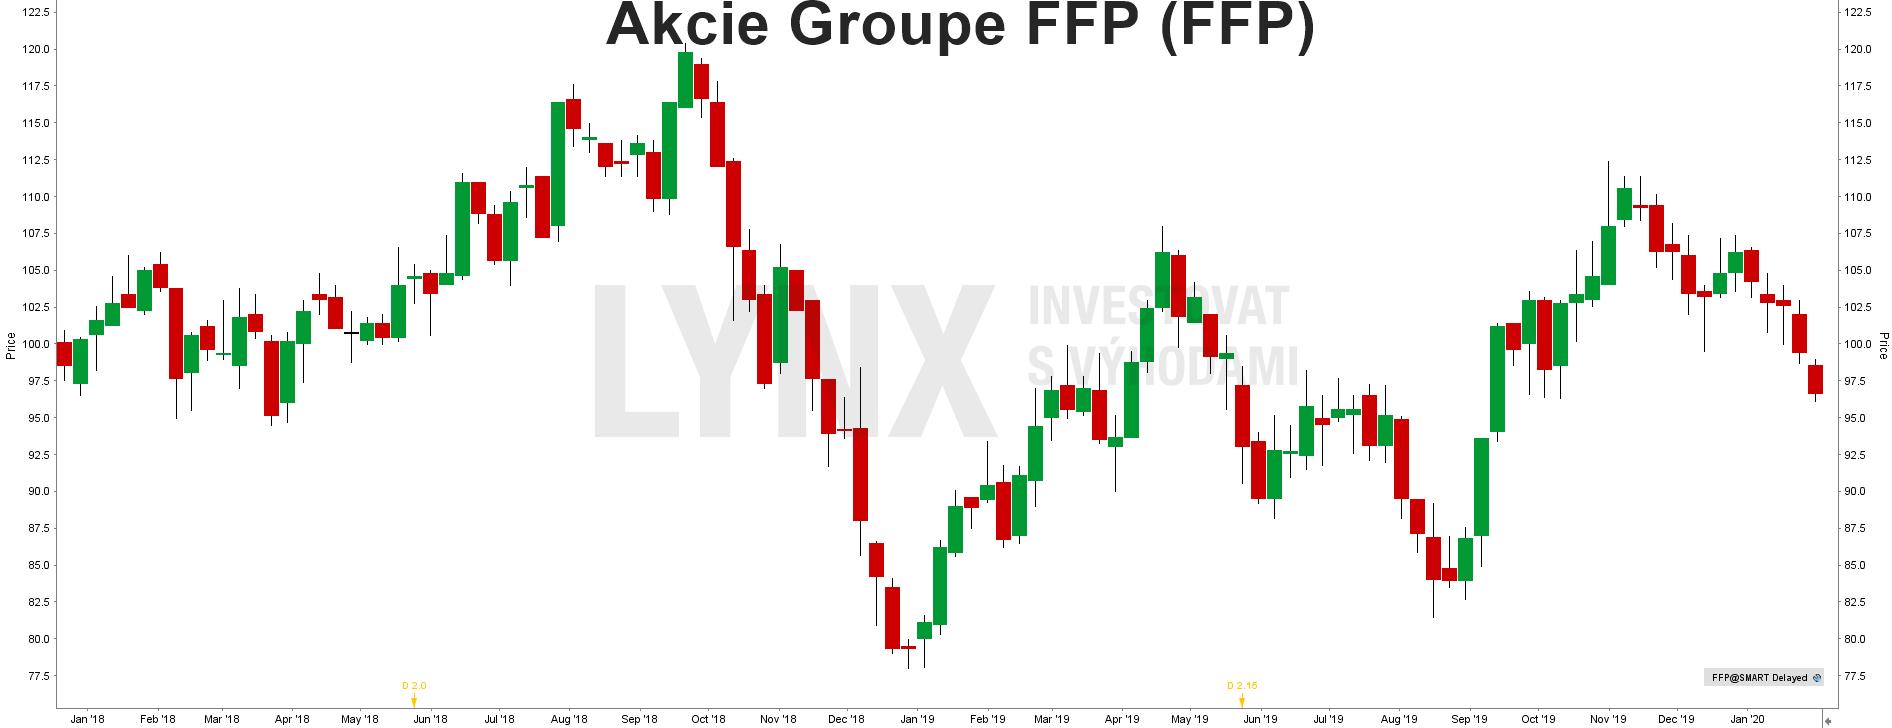 Akcie Groupe FFP